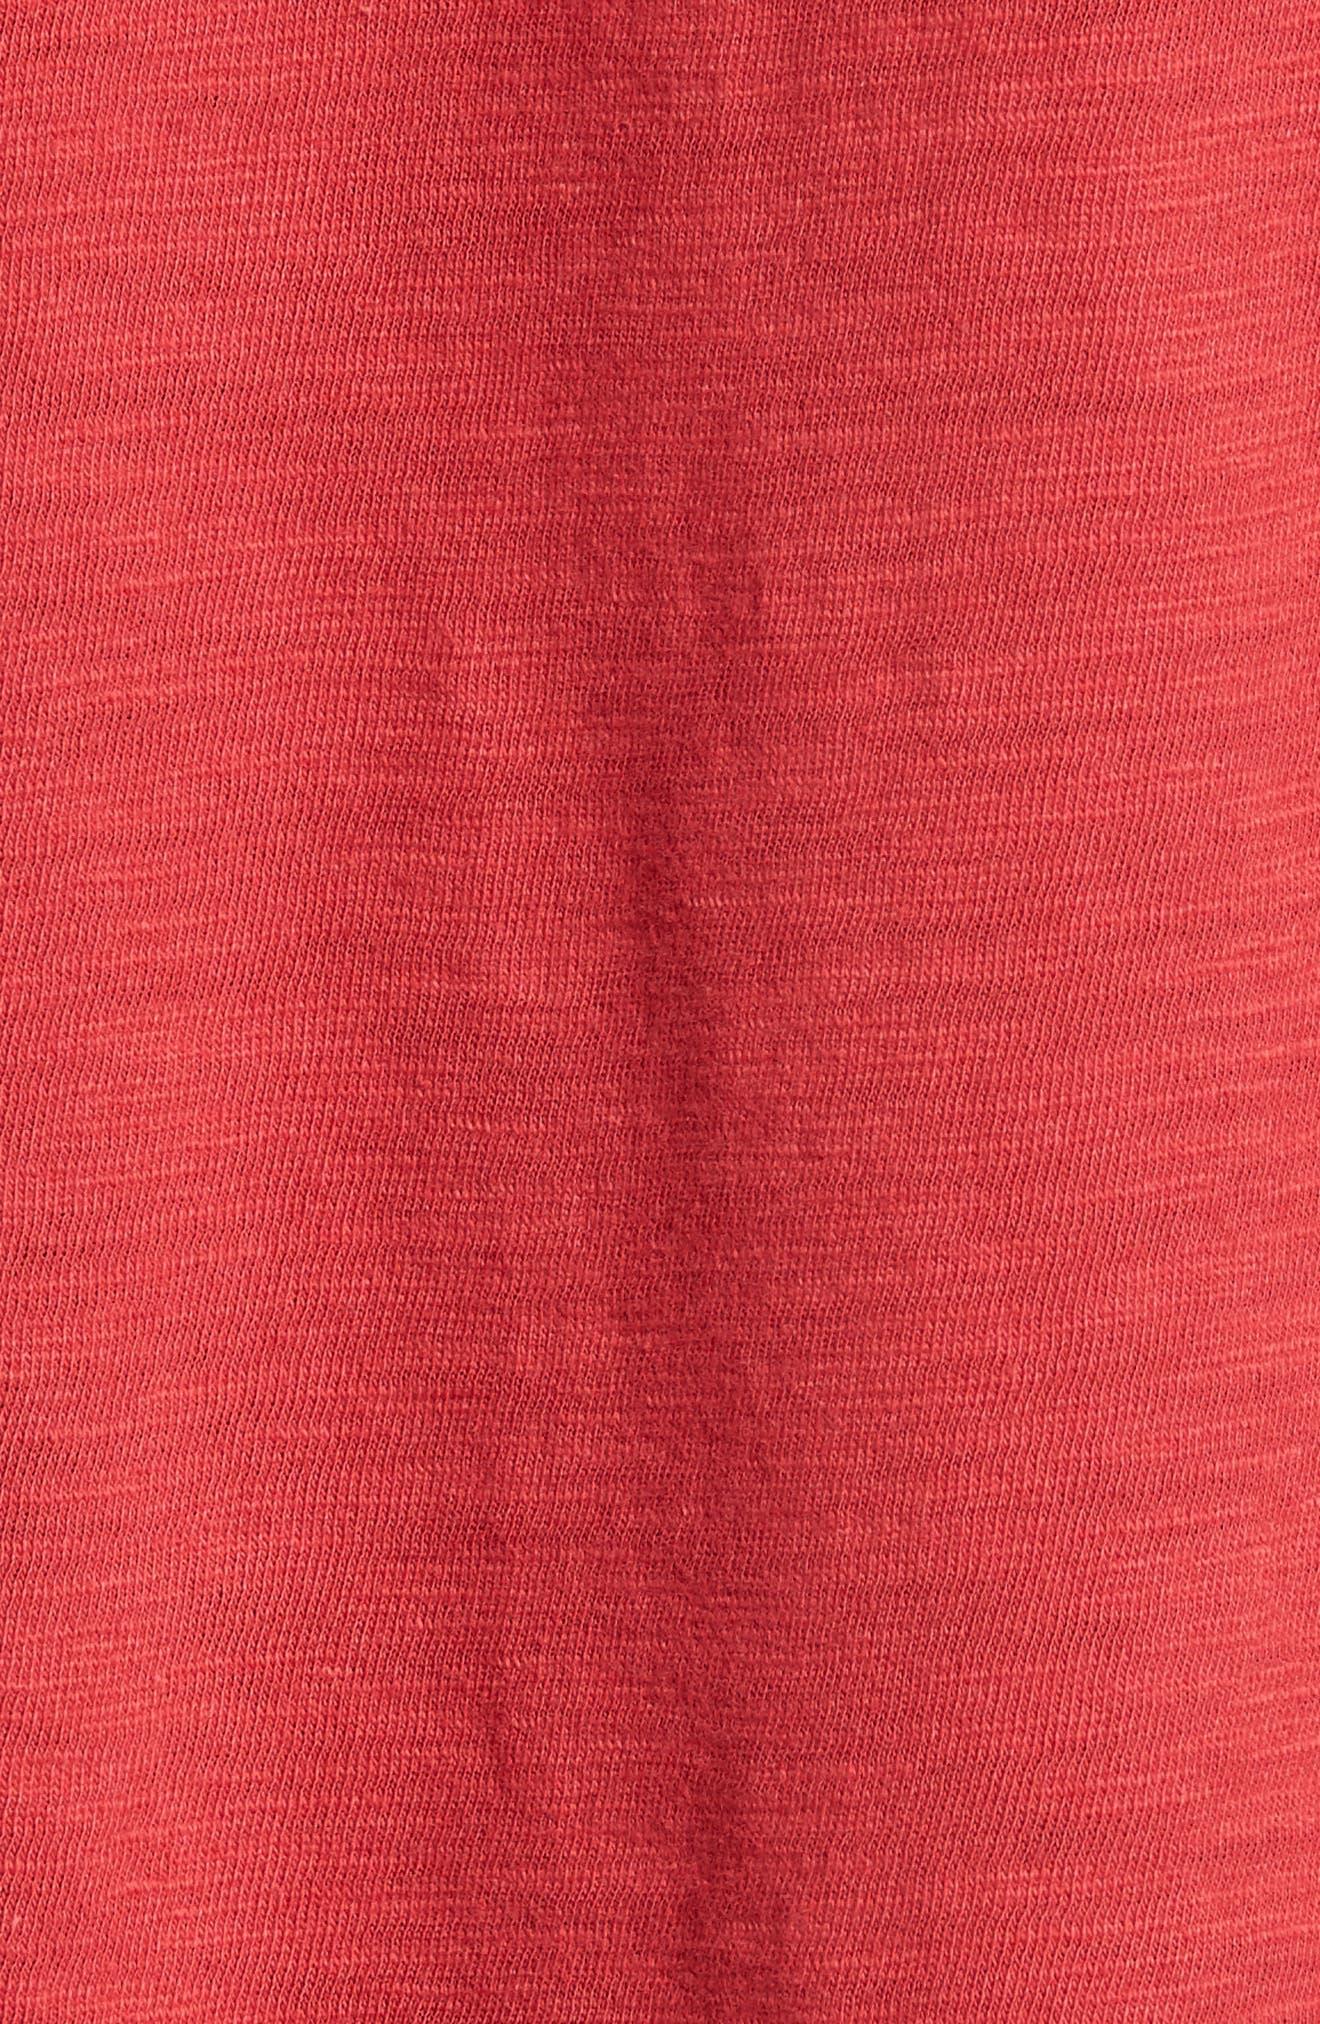 Grit Scrum St. Louis Cardinals T-Shirt,                             Alternate thumbnail 5, color,                             Rescue Red